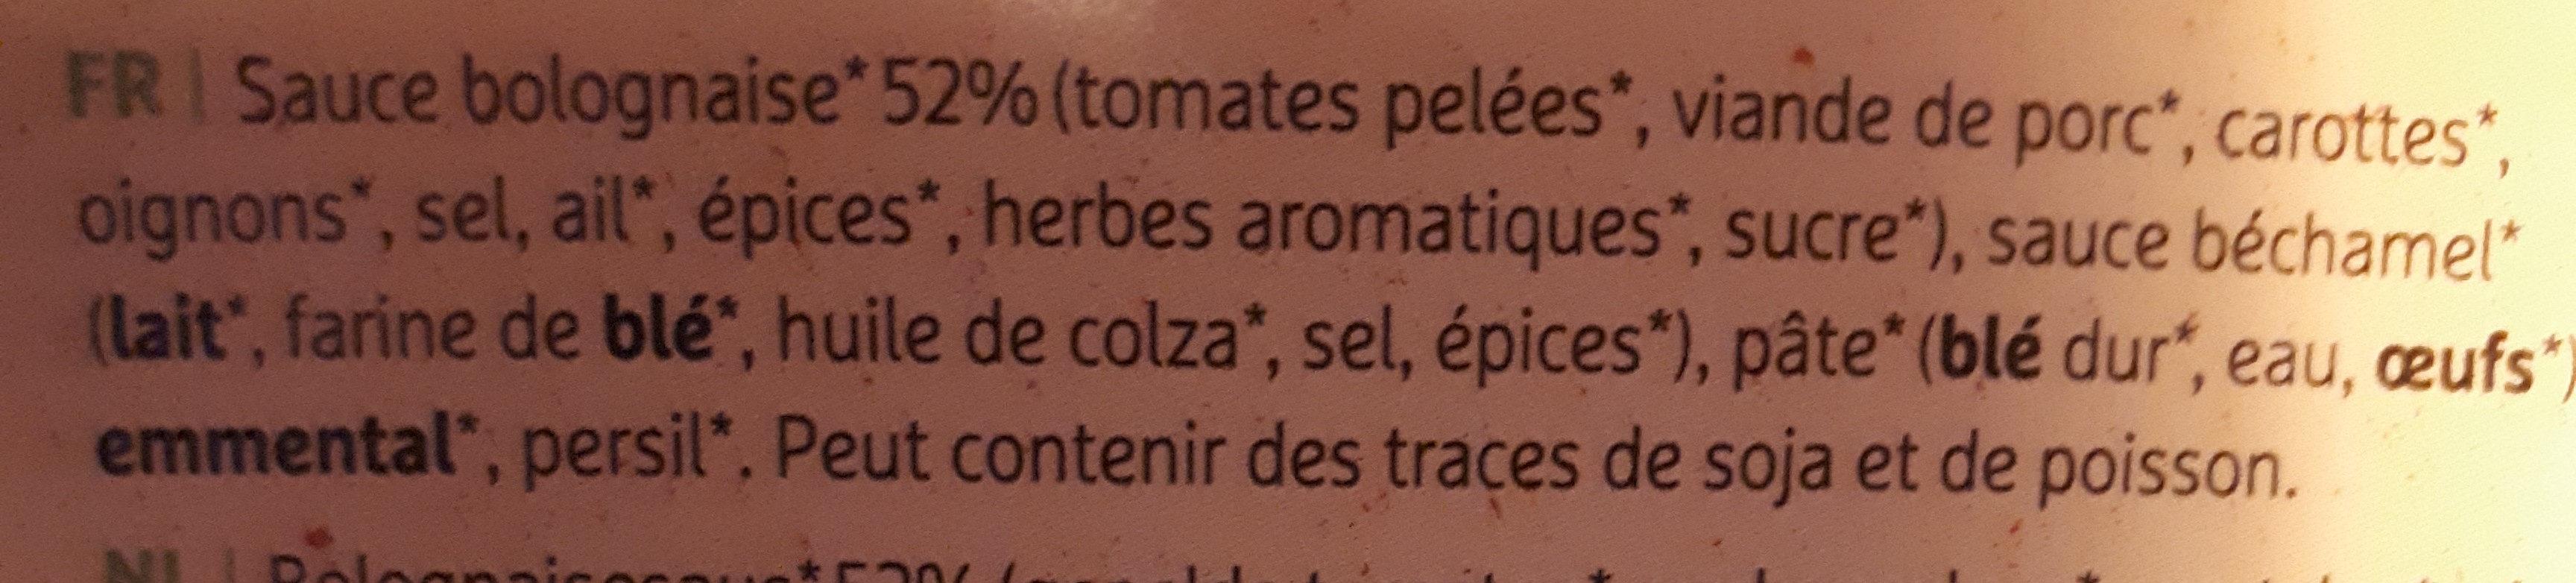 Lasagne bolognaise bio - Ingrediënten - fr